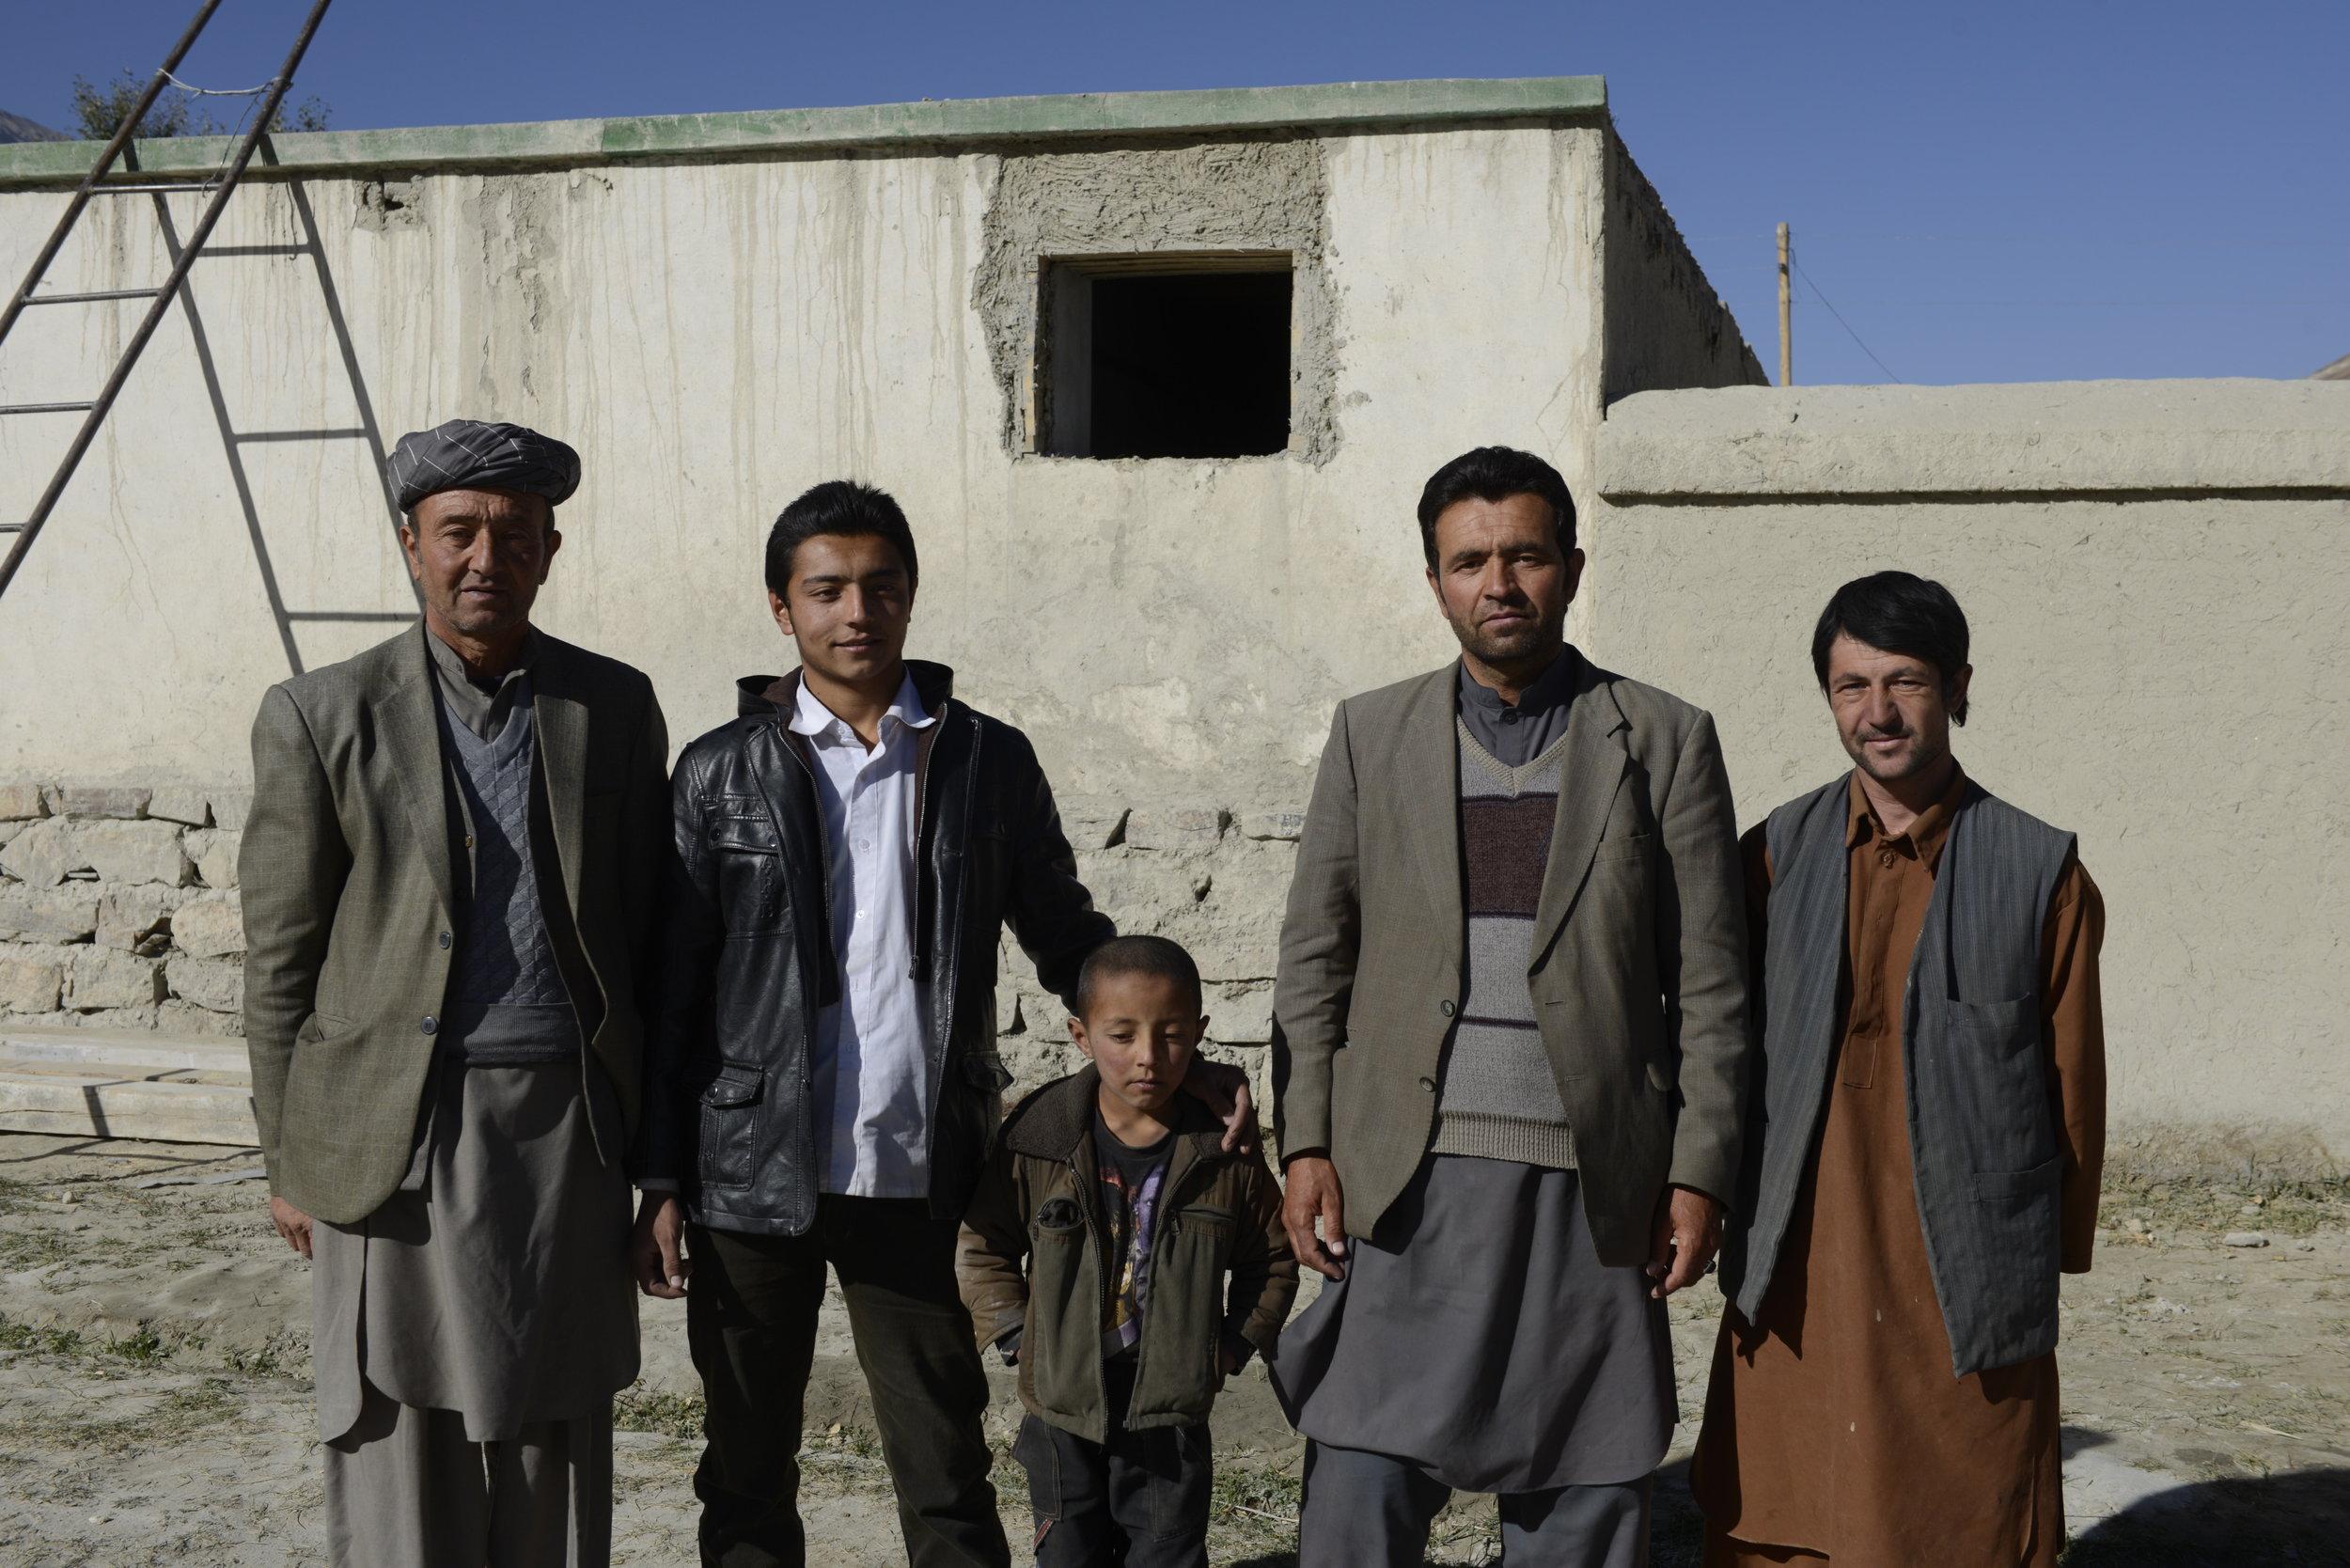 A Pamiri Village in the Wakhan Corridor, Qala-e-Panja, Afghanistan